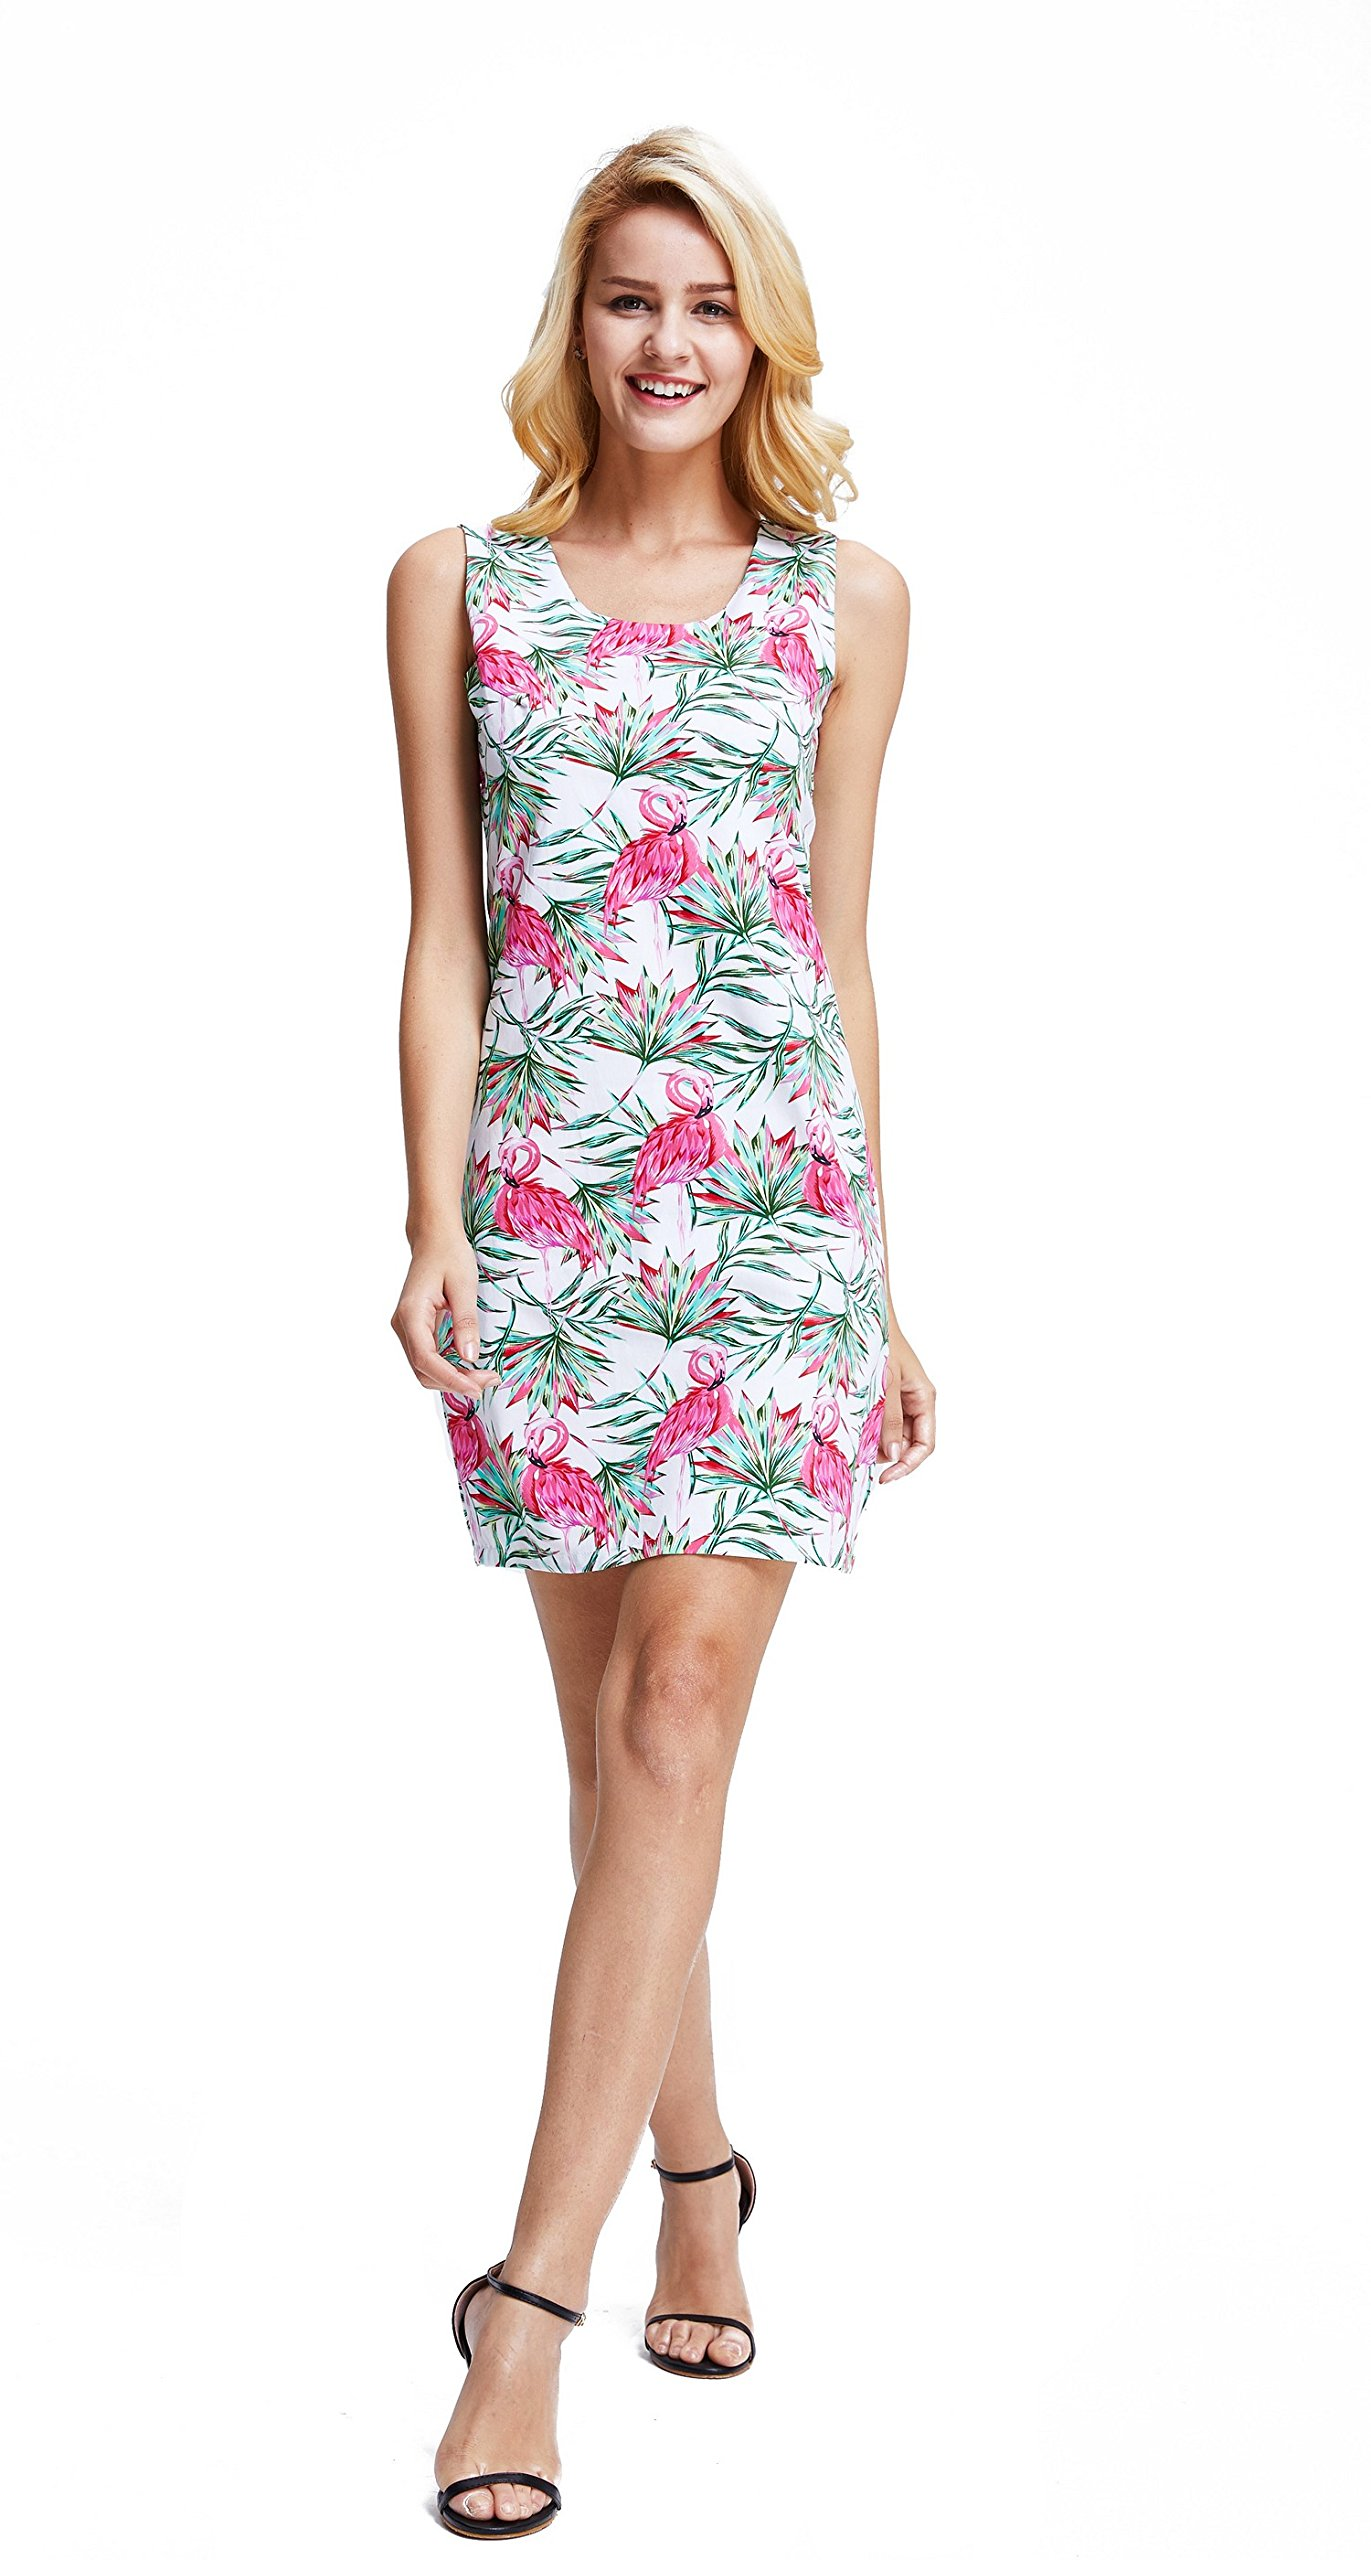 Hawaii Hangover Women's Tank Fit Dress Pink & Green Palms Flamingo in Love M